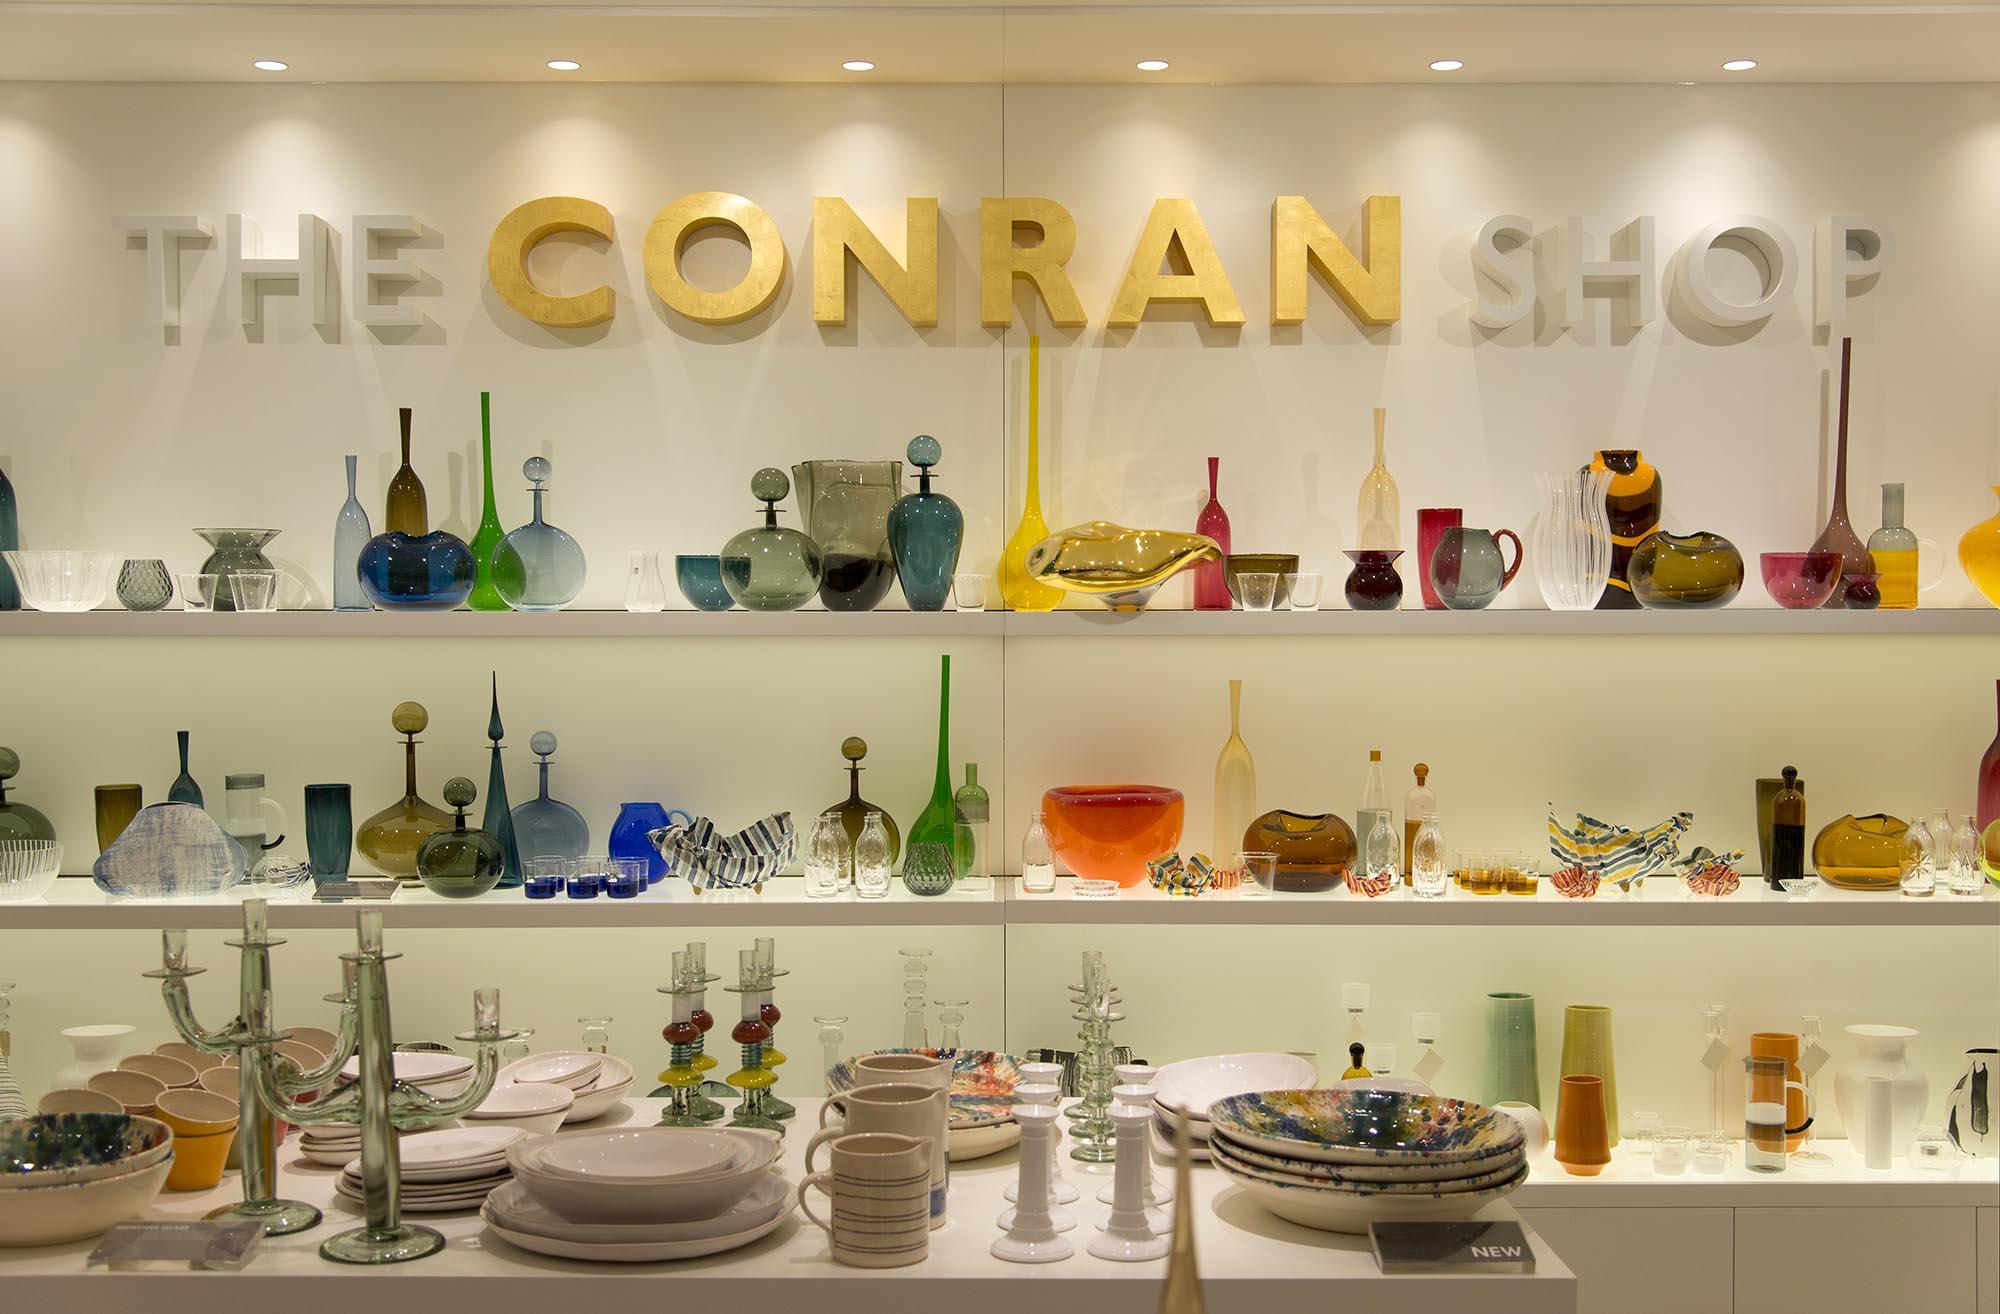 The Conran Shop, Selfridges, London gold leaf logo